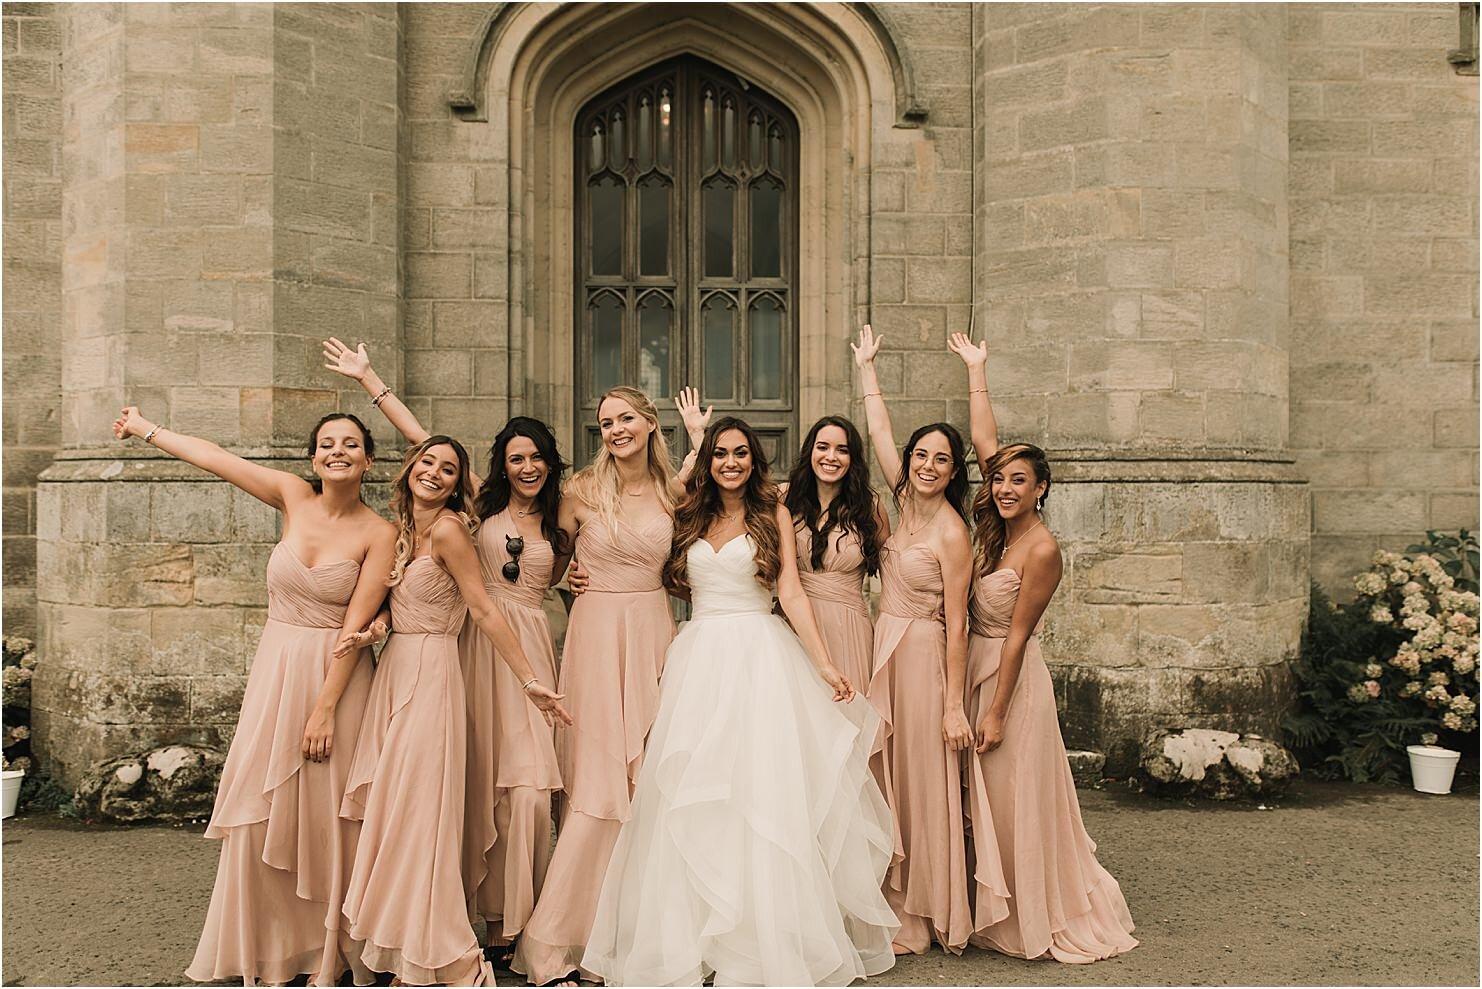 boda-de-cuento-en-castillo-boda-en-londres-73.jpg